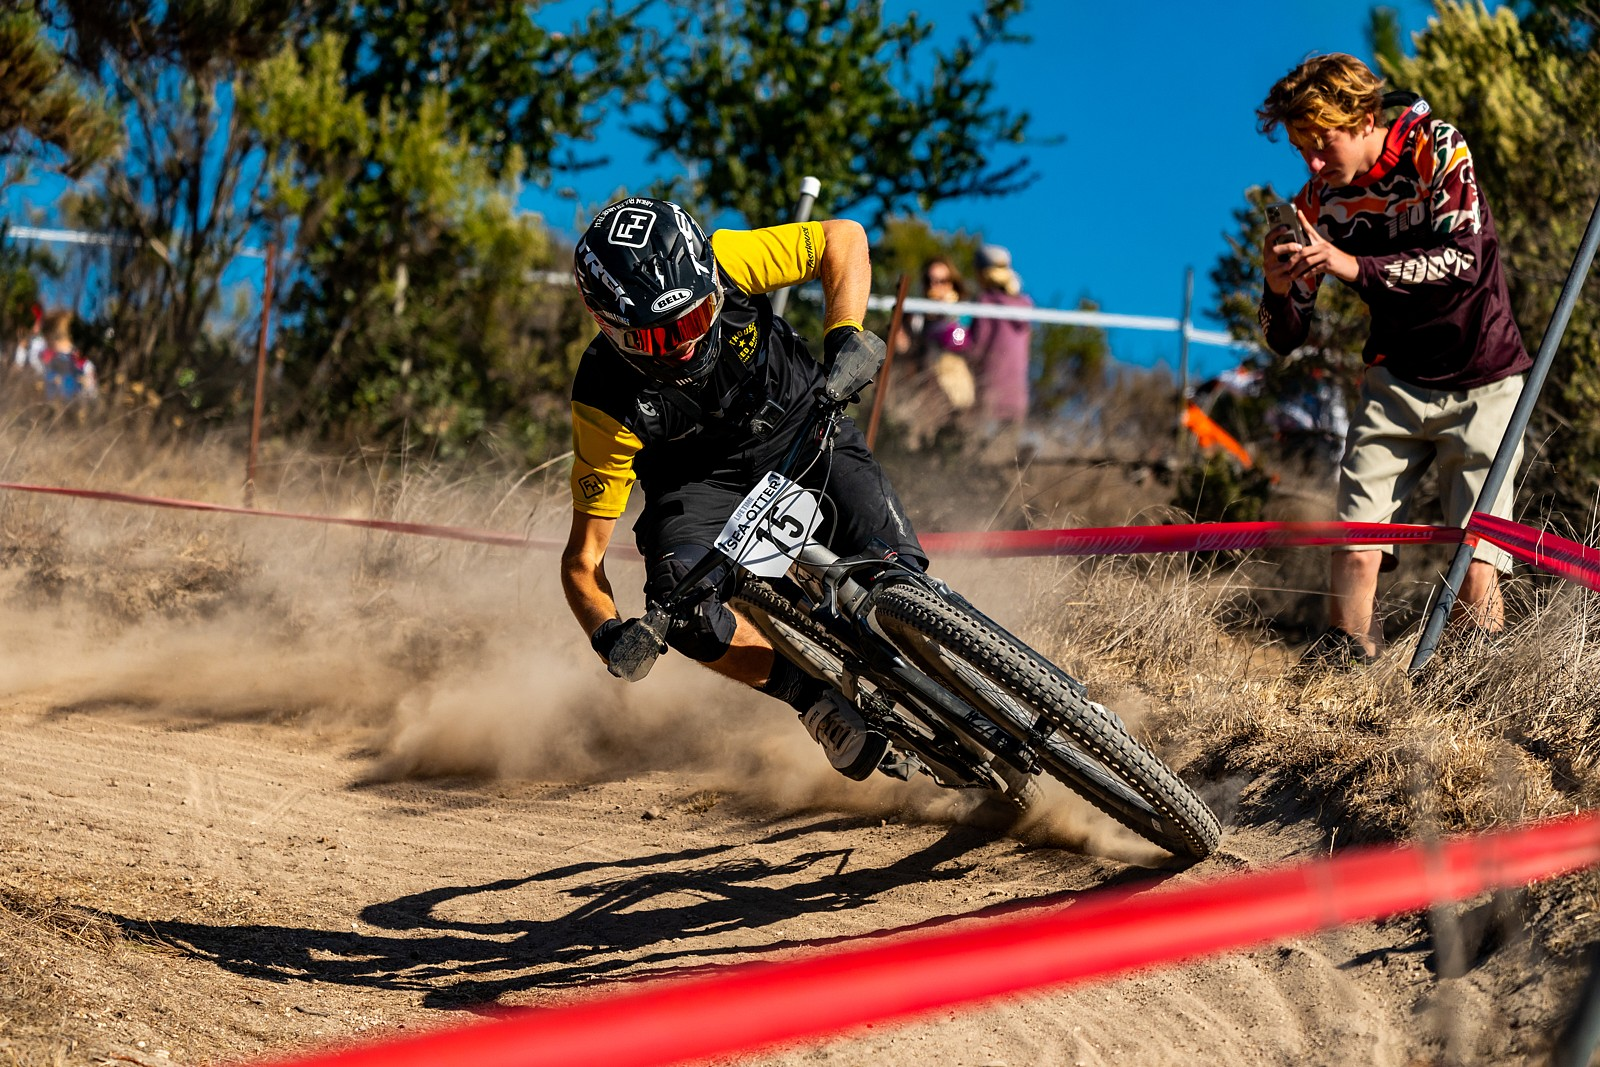 Aiden Chapin - Zuestman - Mountain Biking Pictures - Vital MTB